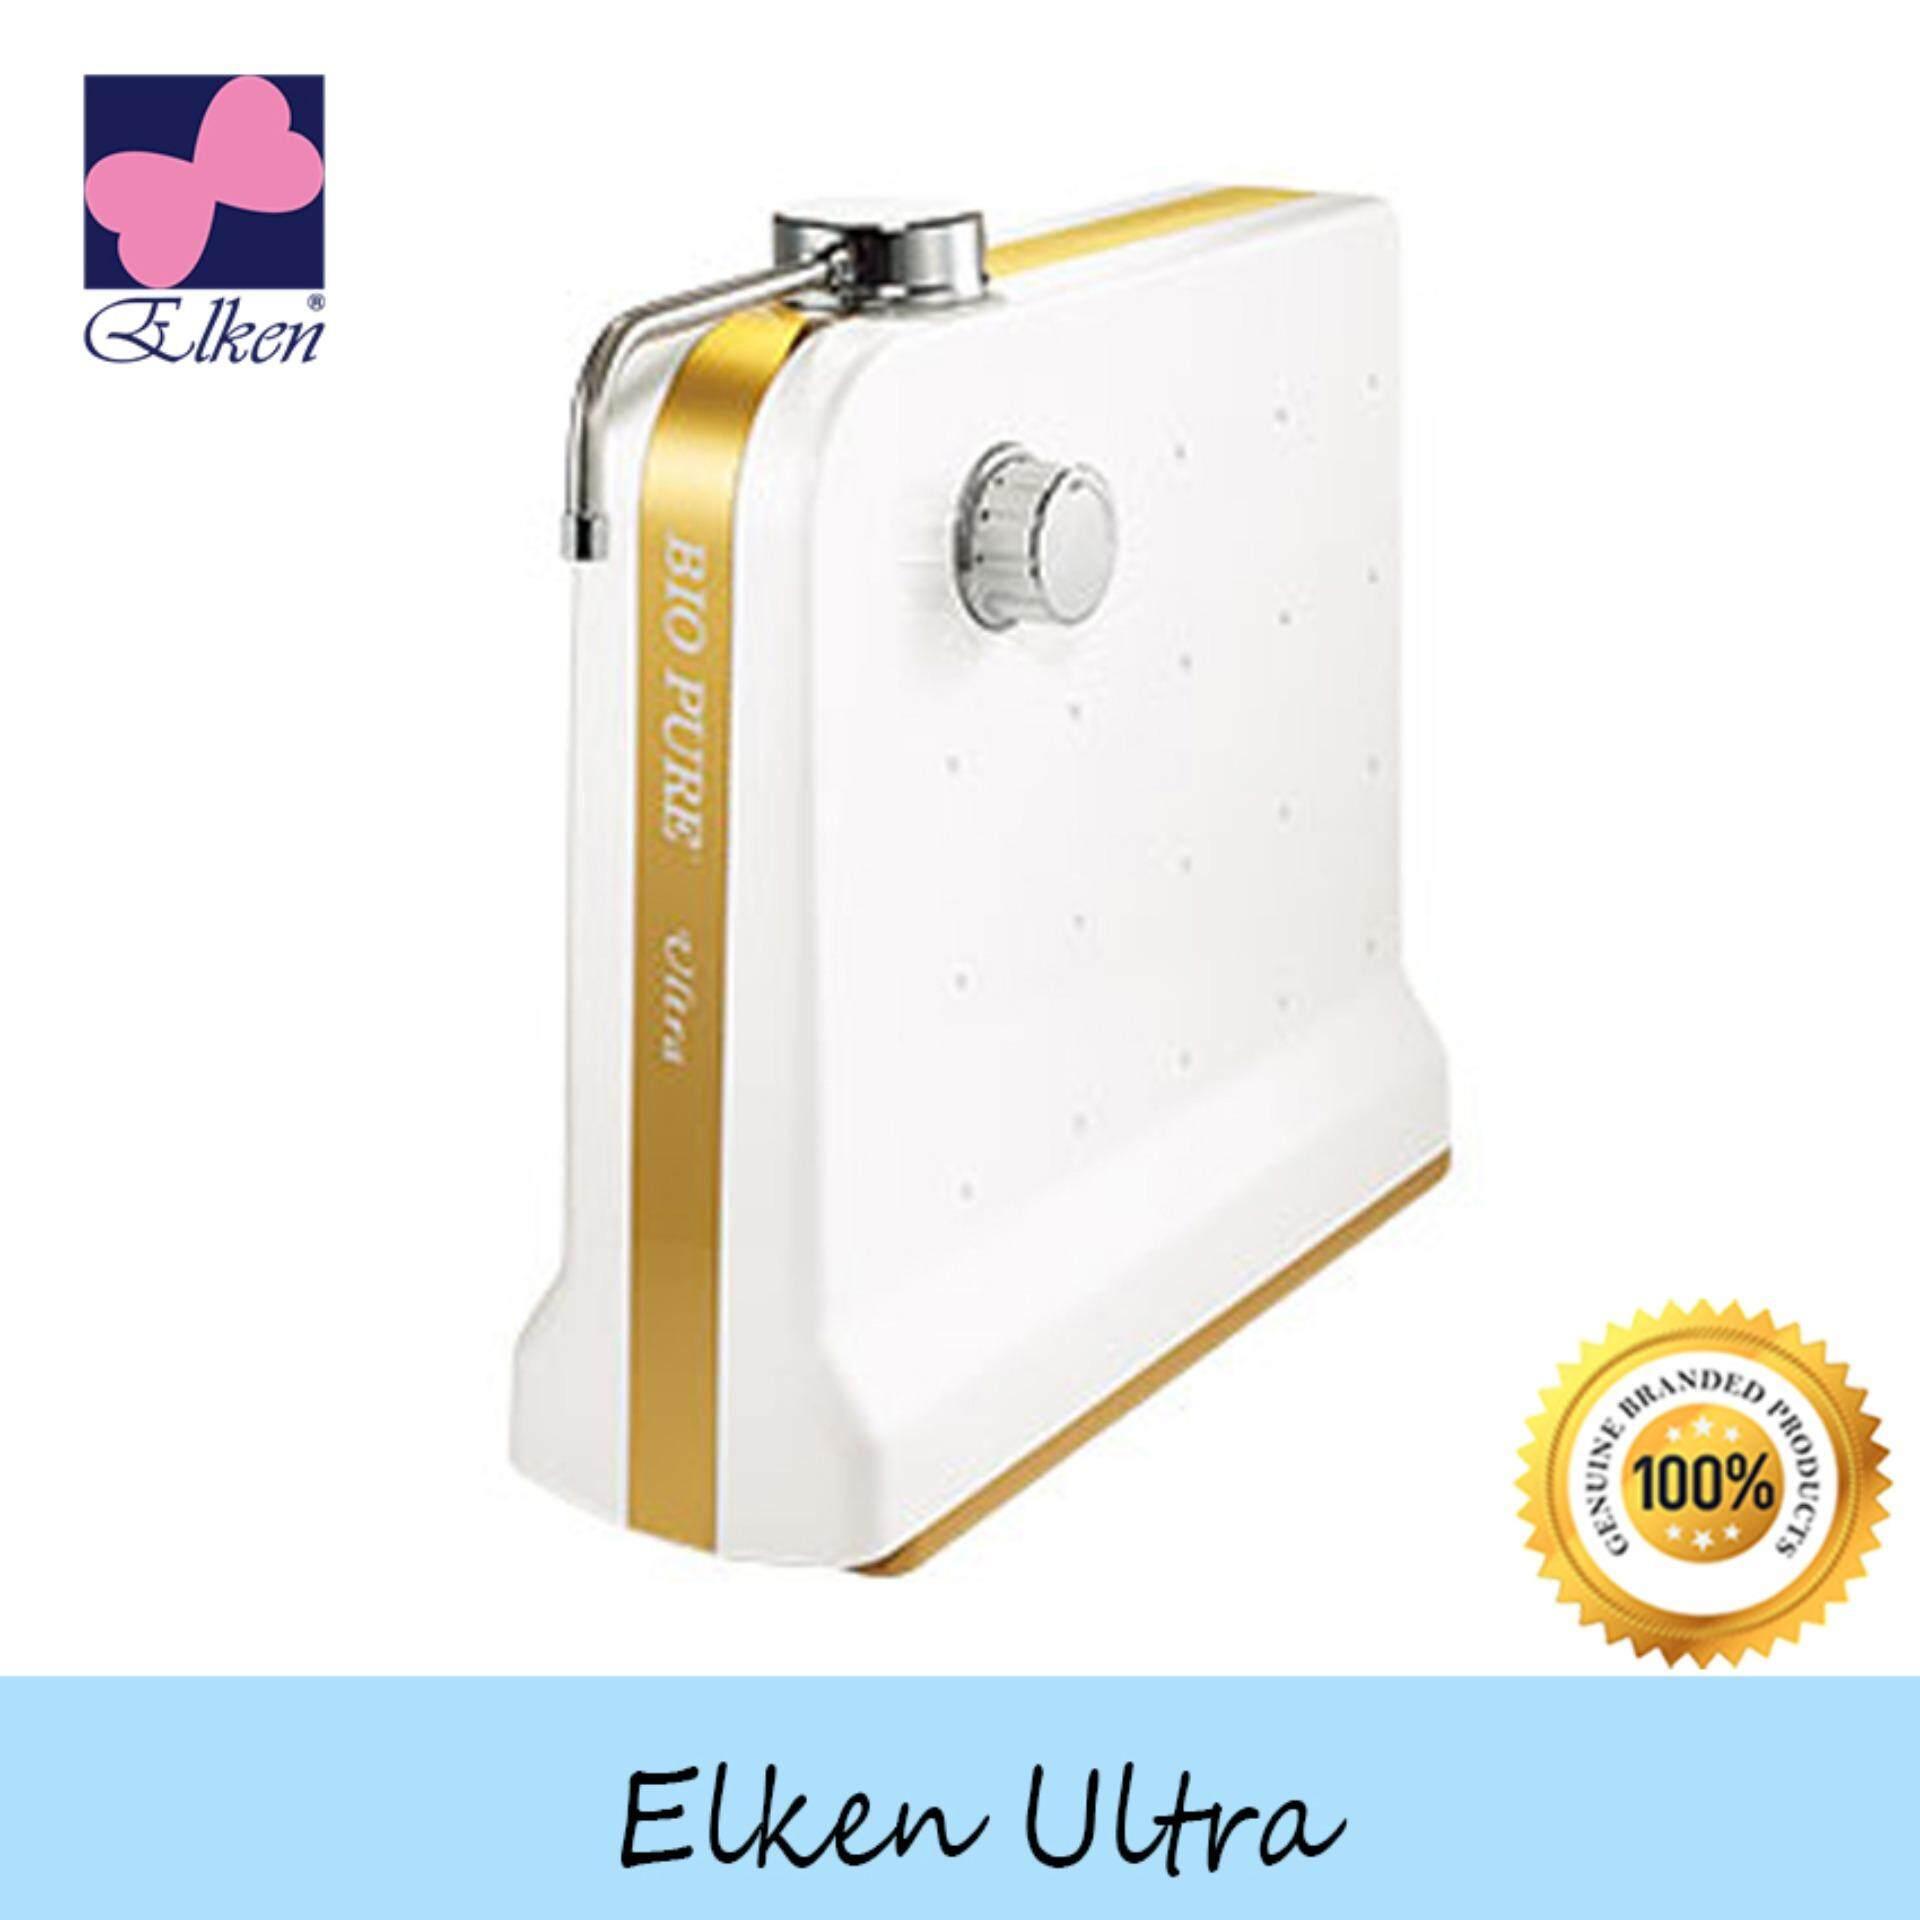 Elken Bio Pure Ultra Water Purifier with Pre-Filter- ENBPULP2